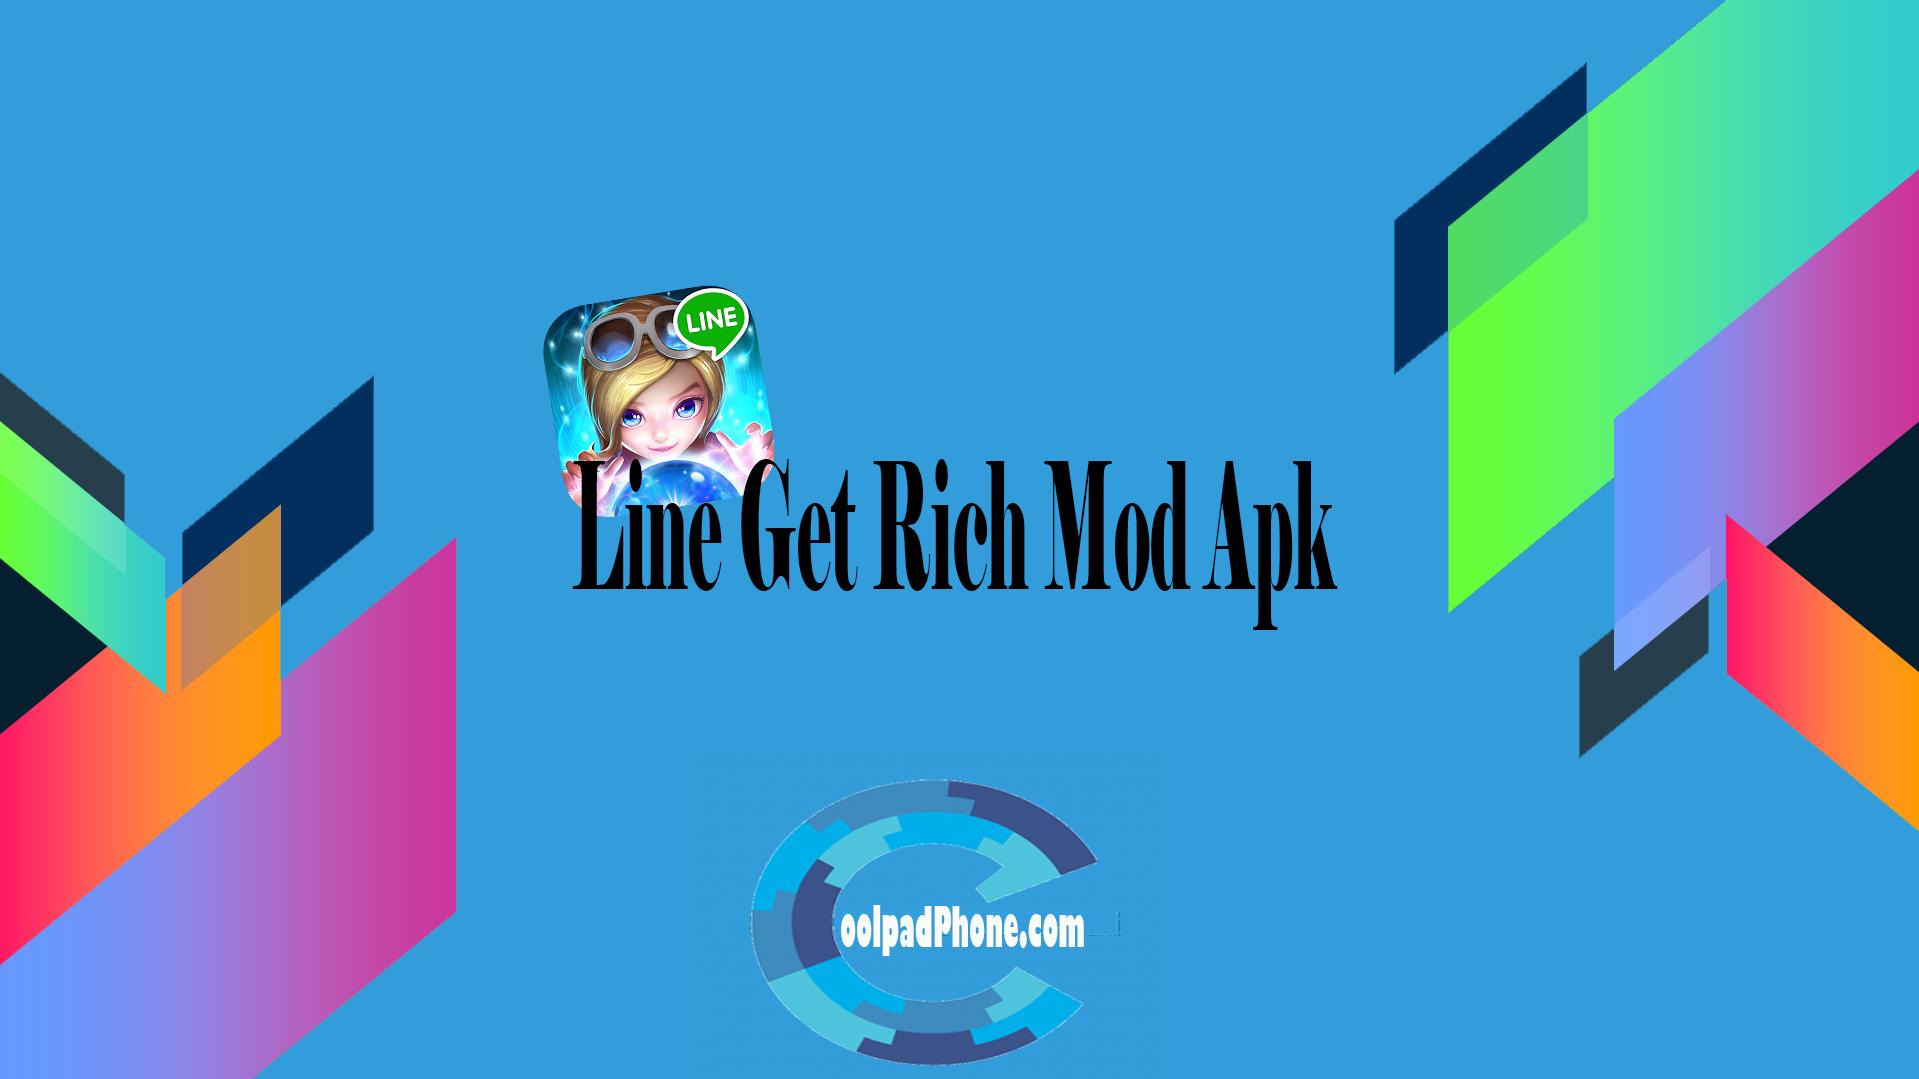 Line Get Rich Mod Apk